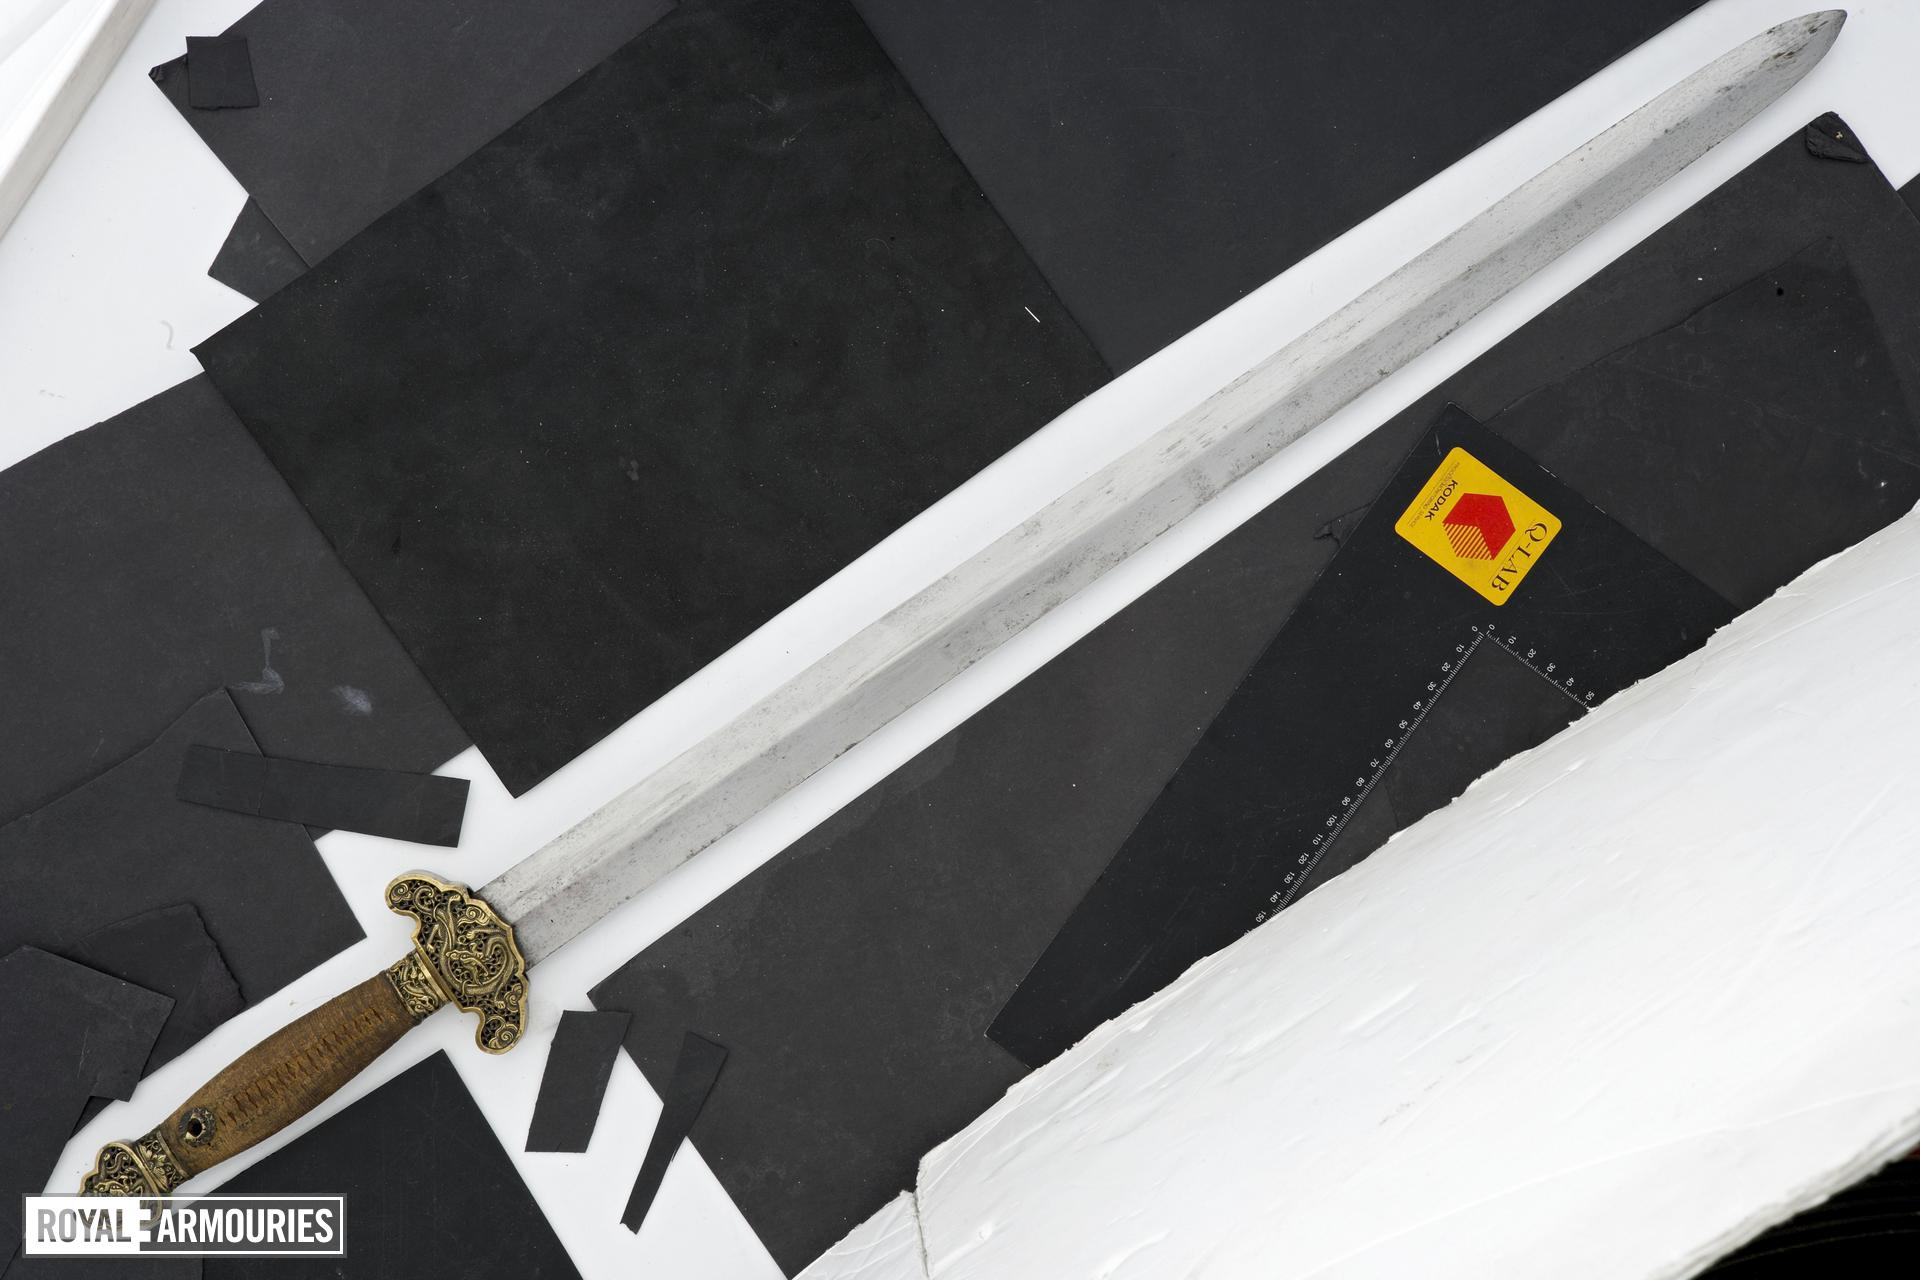 Sword (jian) and scabbard